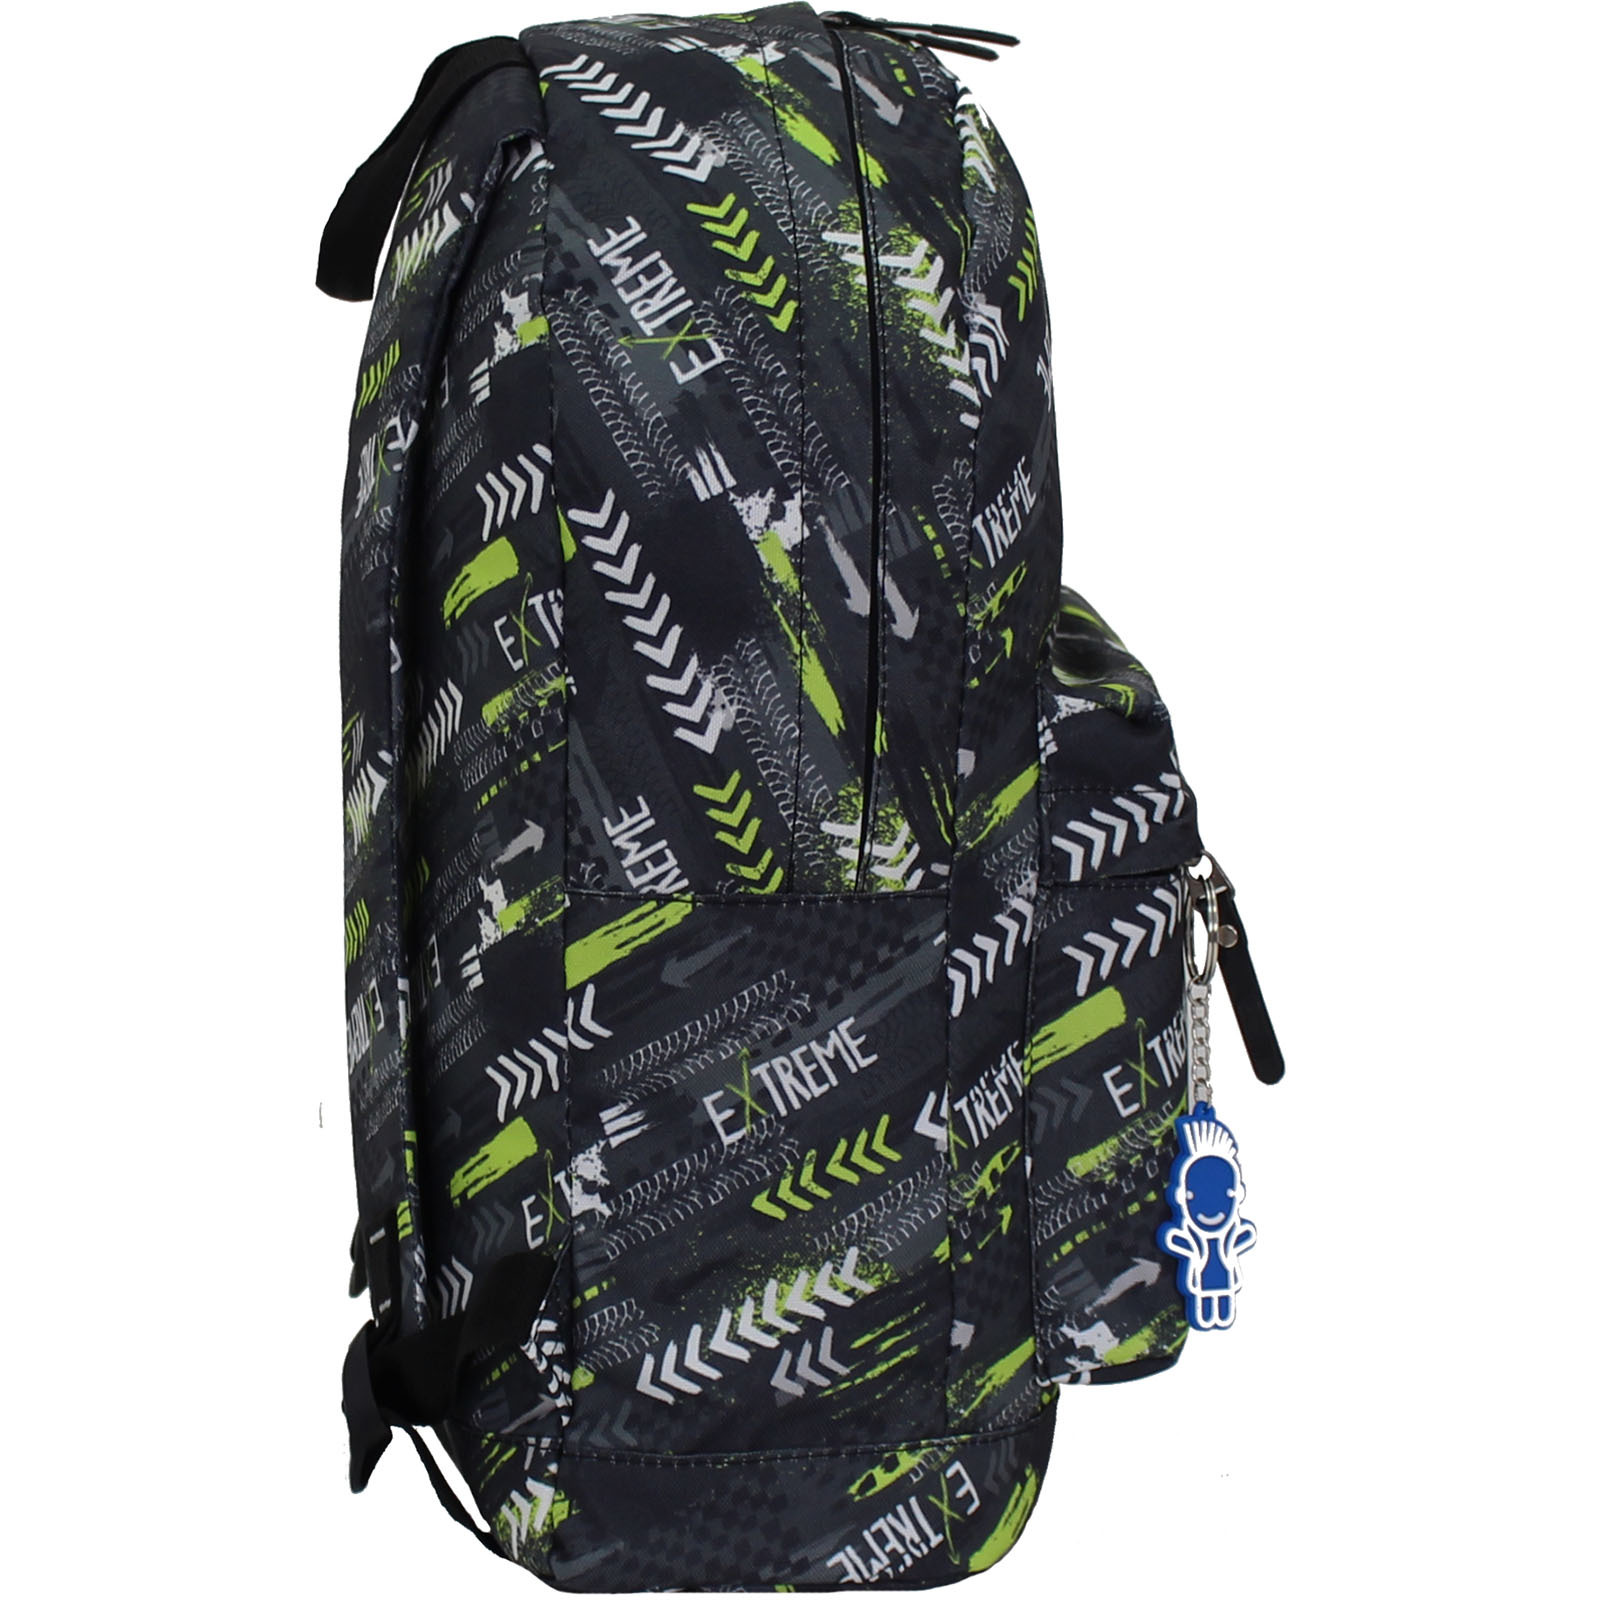 Рюкзак Bagland Молодежный (дизайн) 17 л. сублимация 256 (00533664)